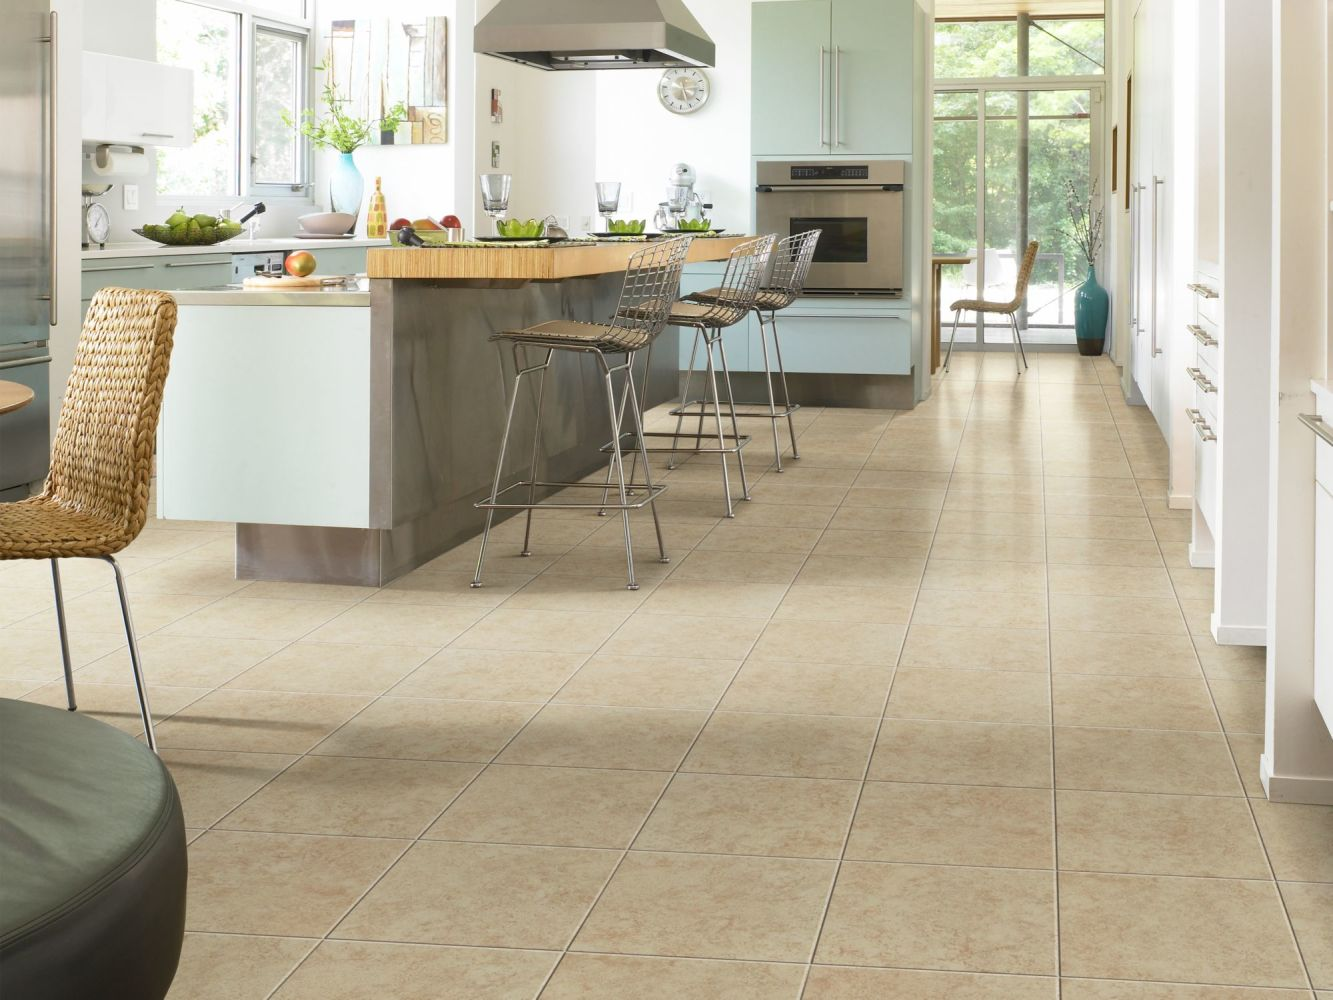 Shaw Floors Home Fn Gold Ceramic Milan 13 Cafe 00700_TGK08